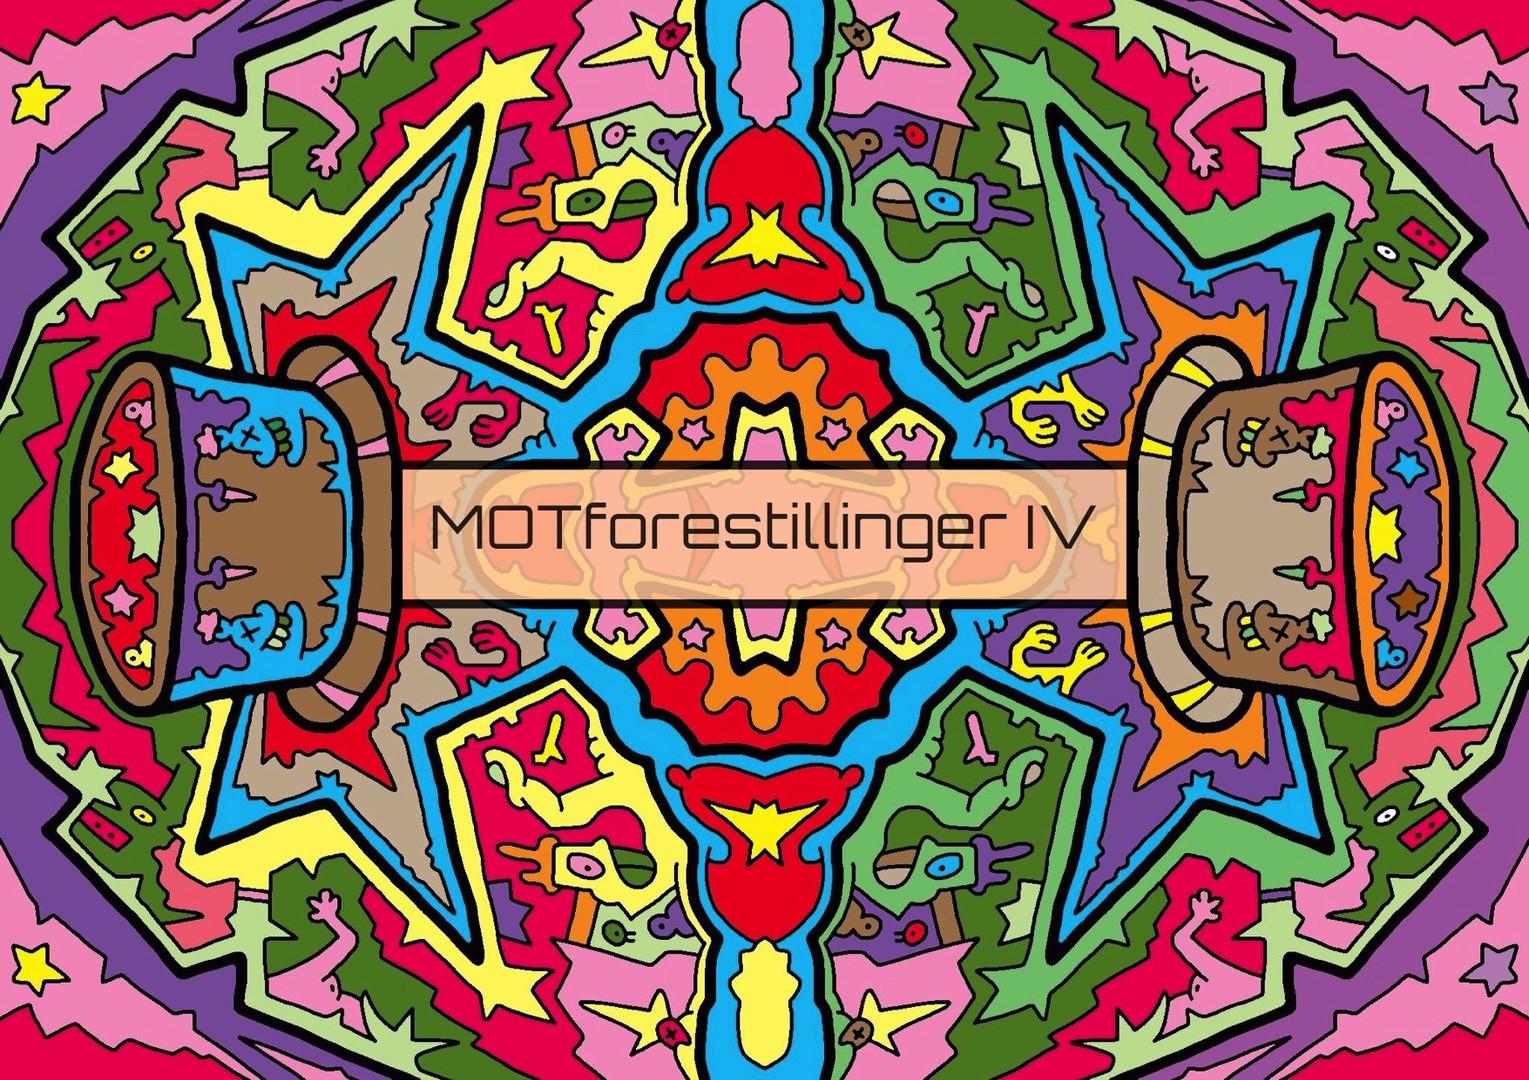 MOTforestillinger IV, 08.–13.11.17